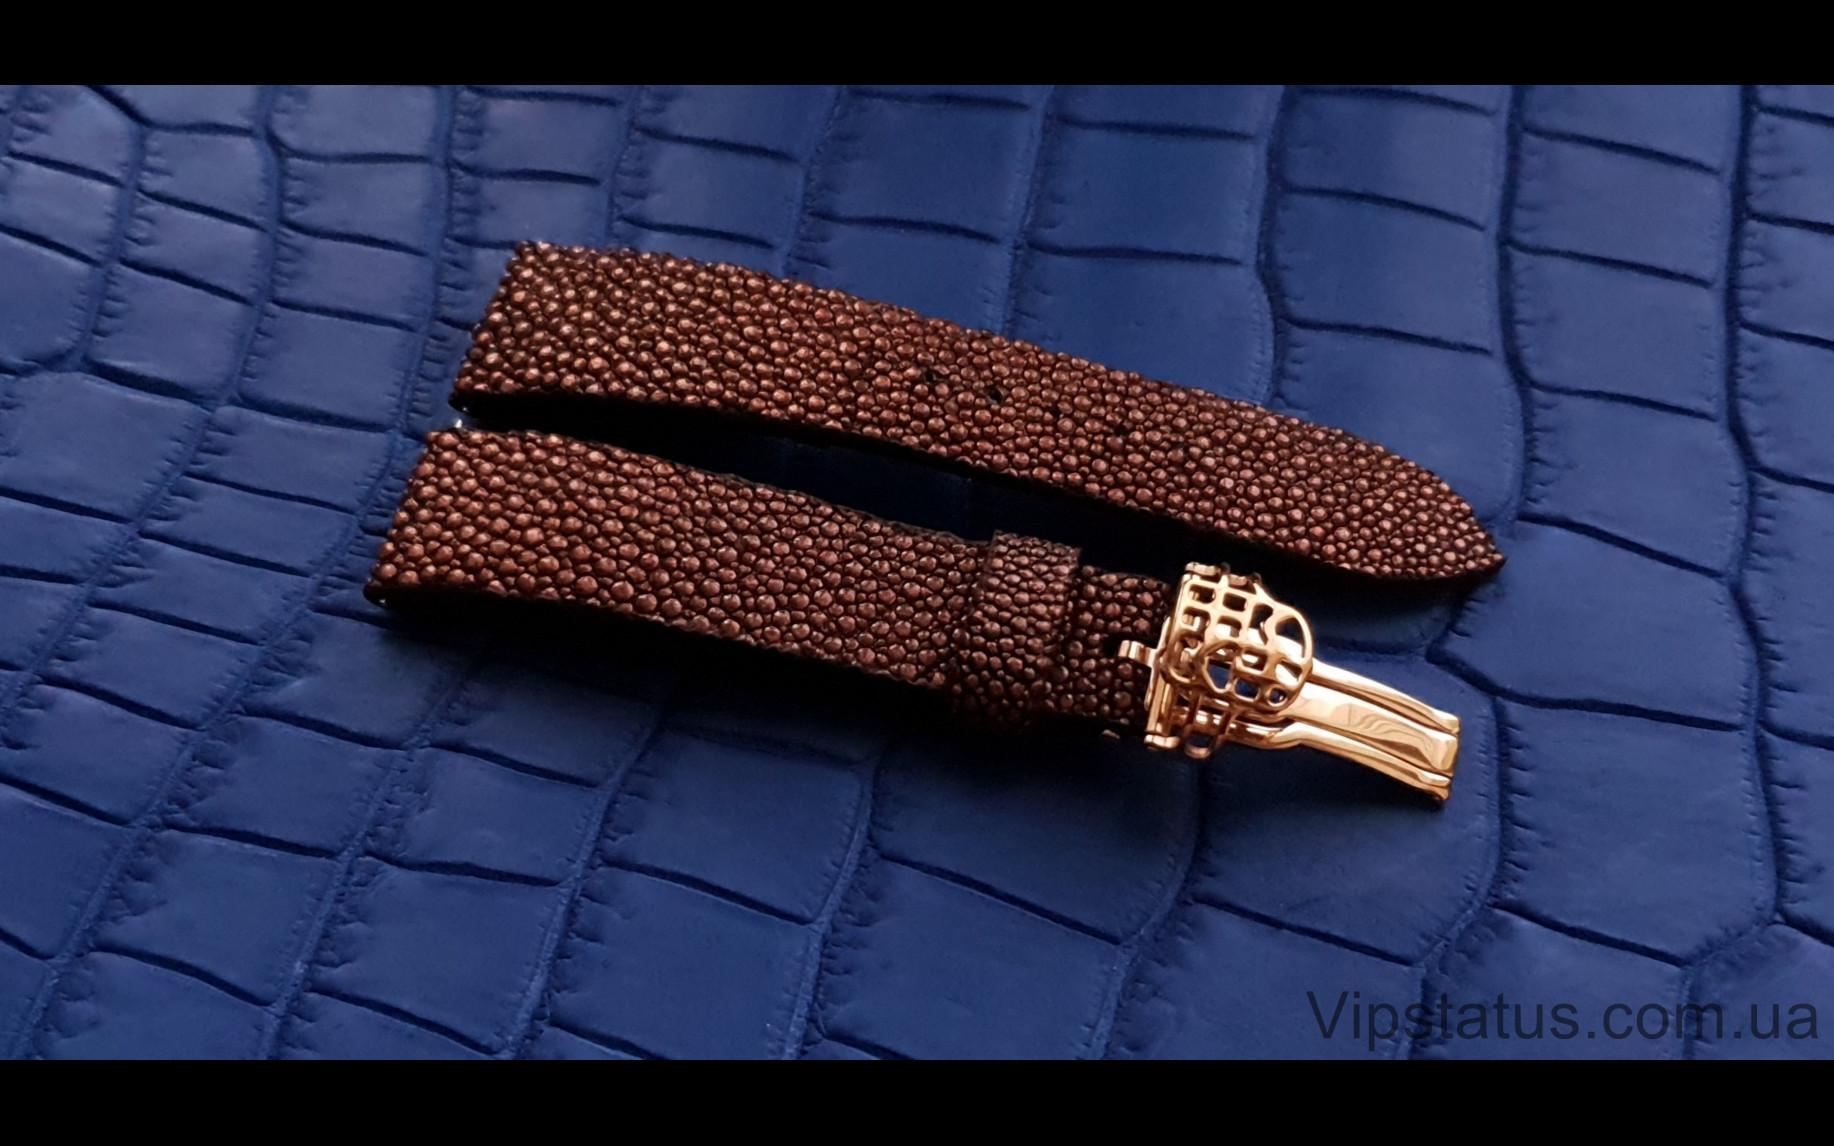 Elite Лакшери ремешок для часов Frederique Constant кожа ската Luxury Stingray Leather Strap for Frederique Constant watches image 3